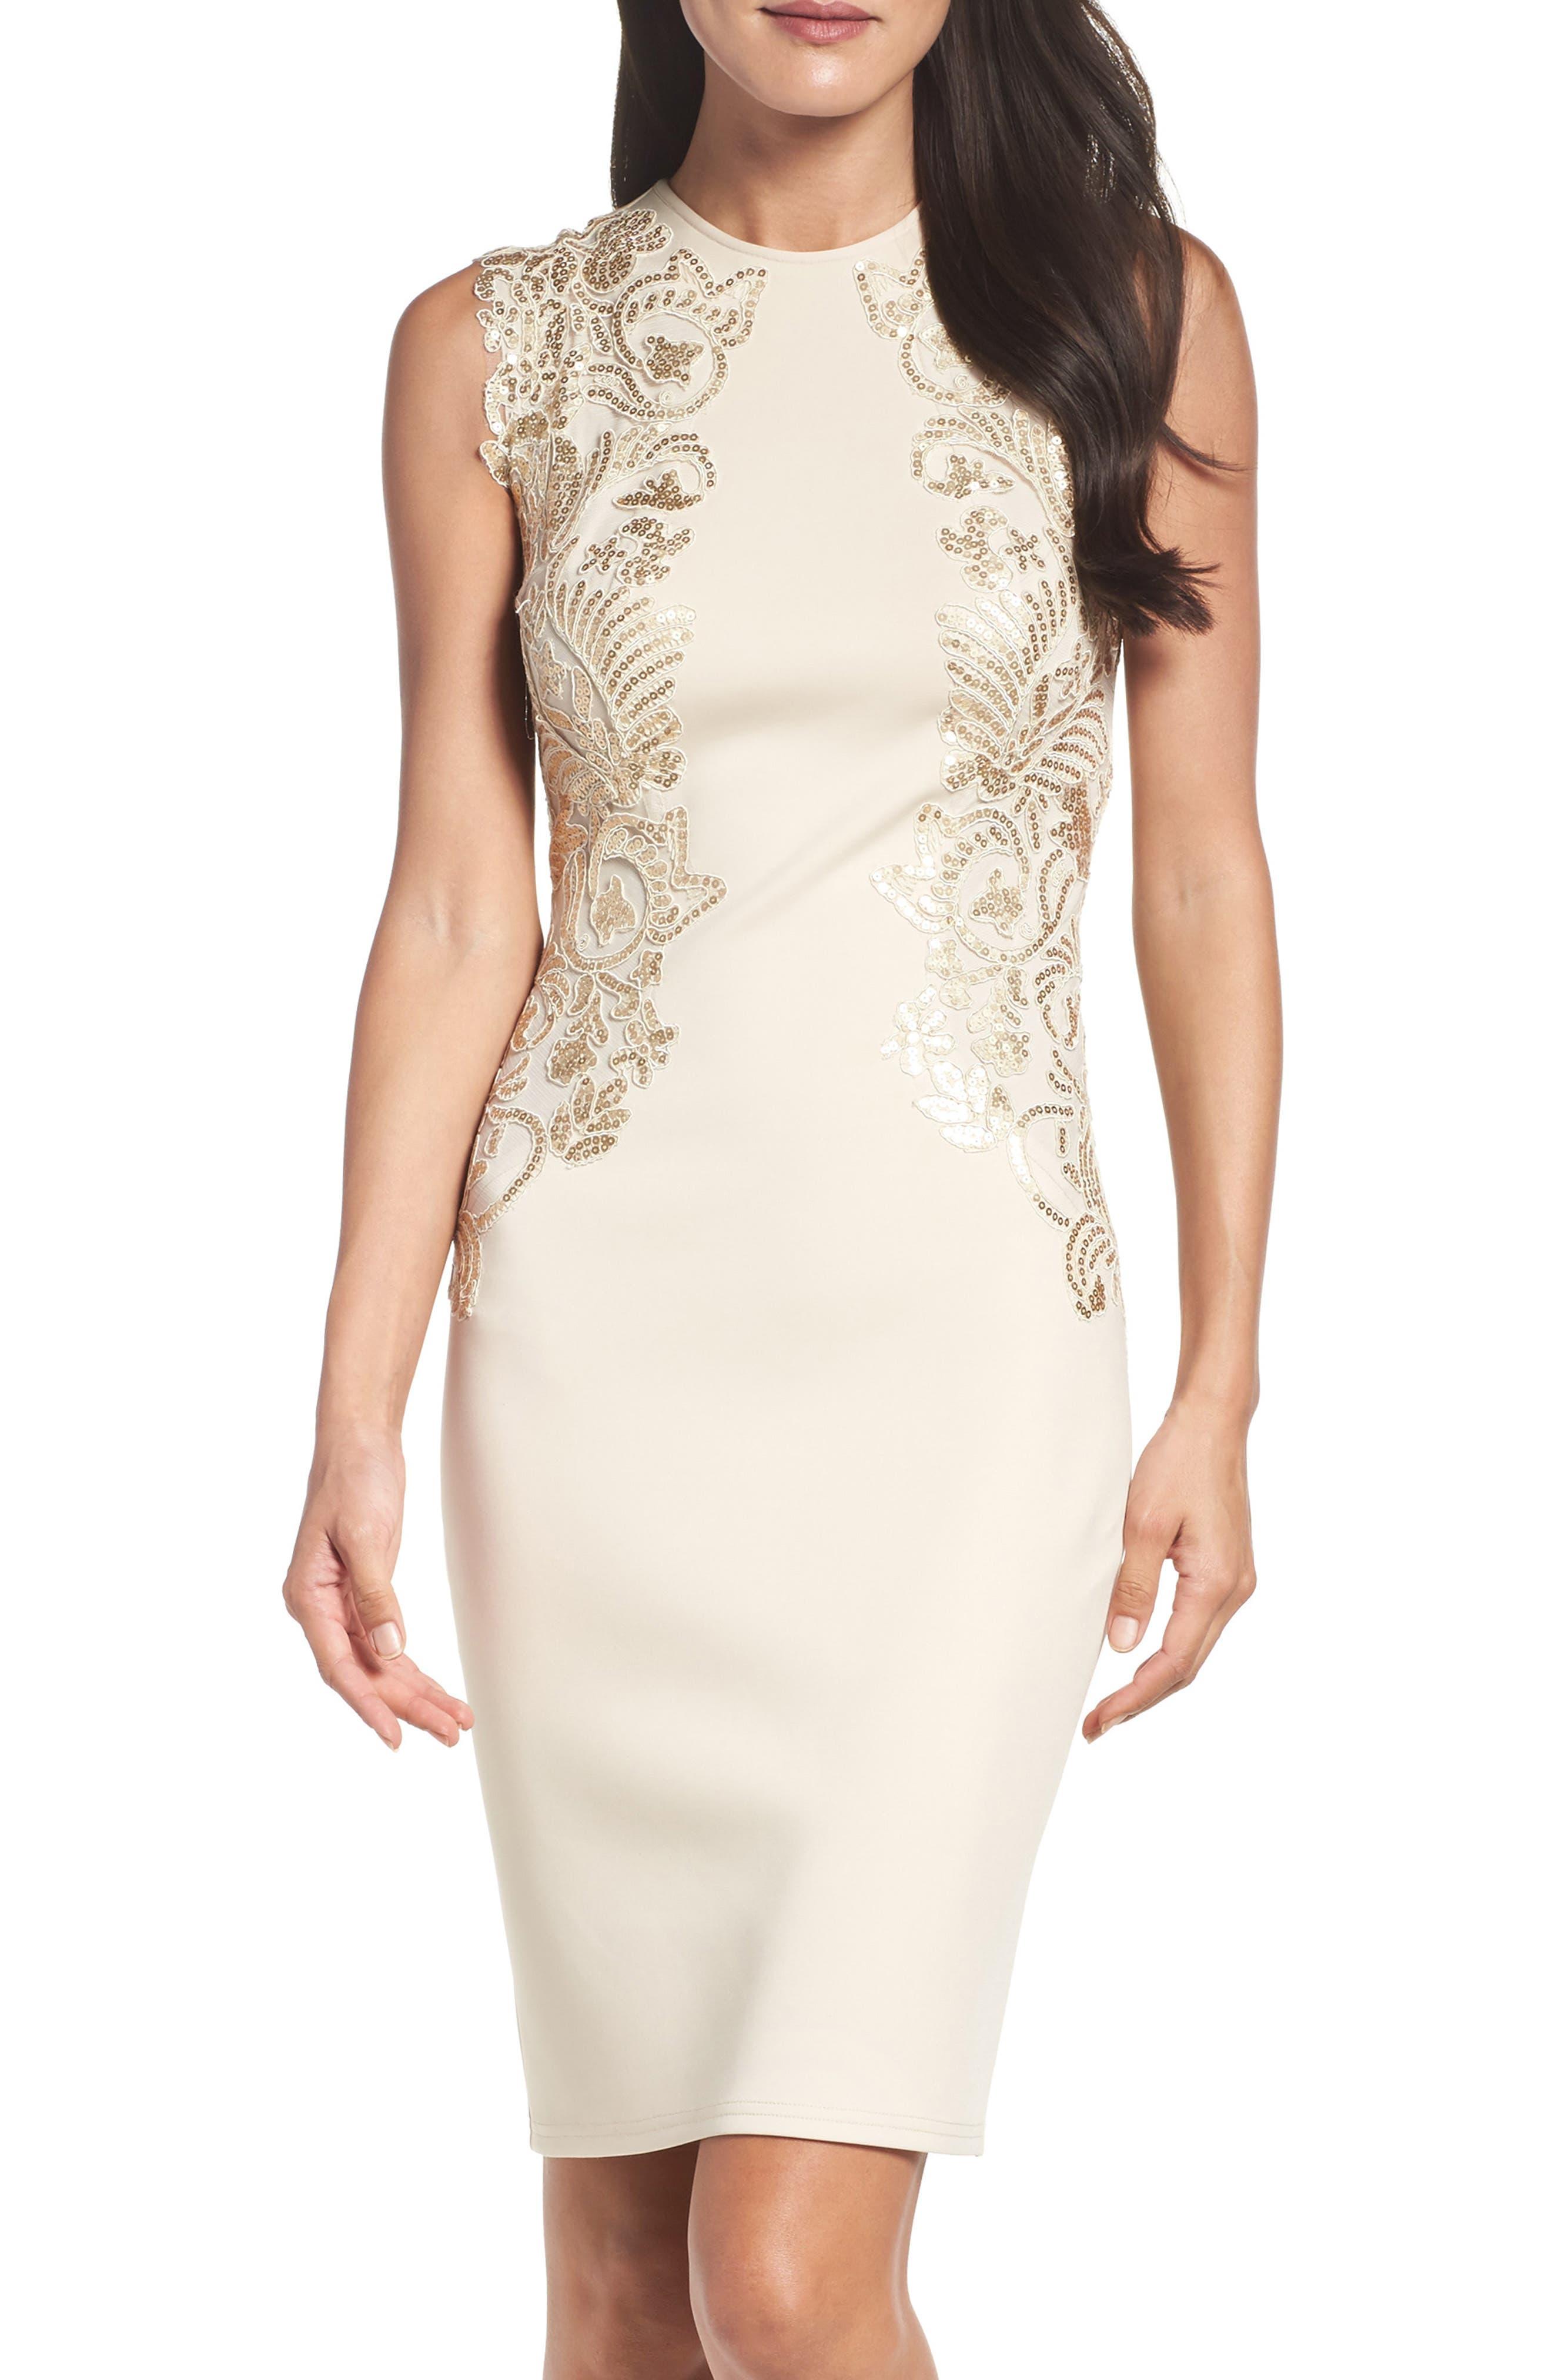 Sequin Appliqué Neoprene Sheath Dress,                             Main thumbnail 1, color,                             250